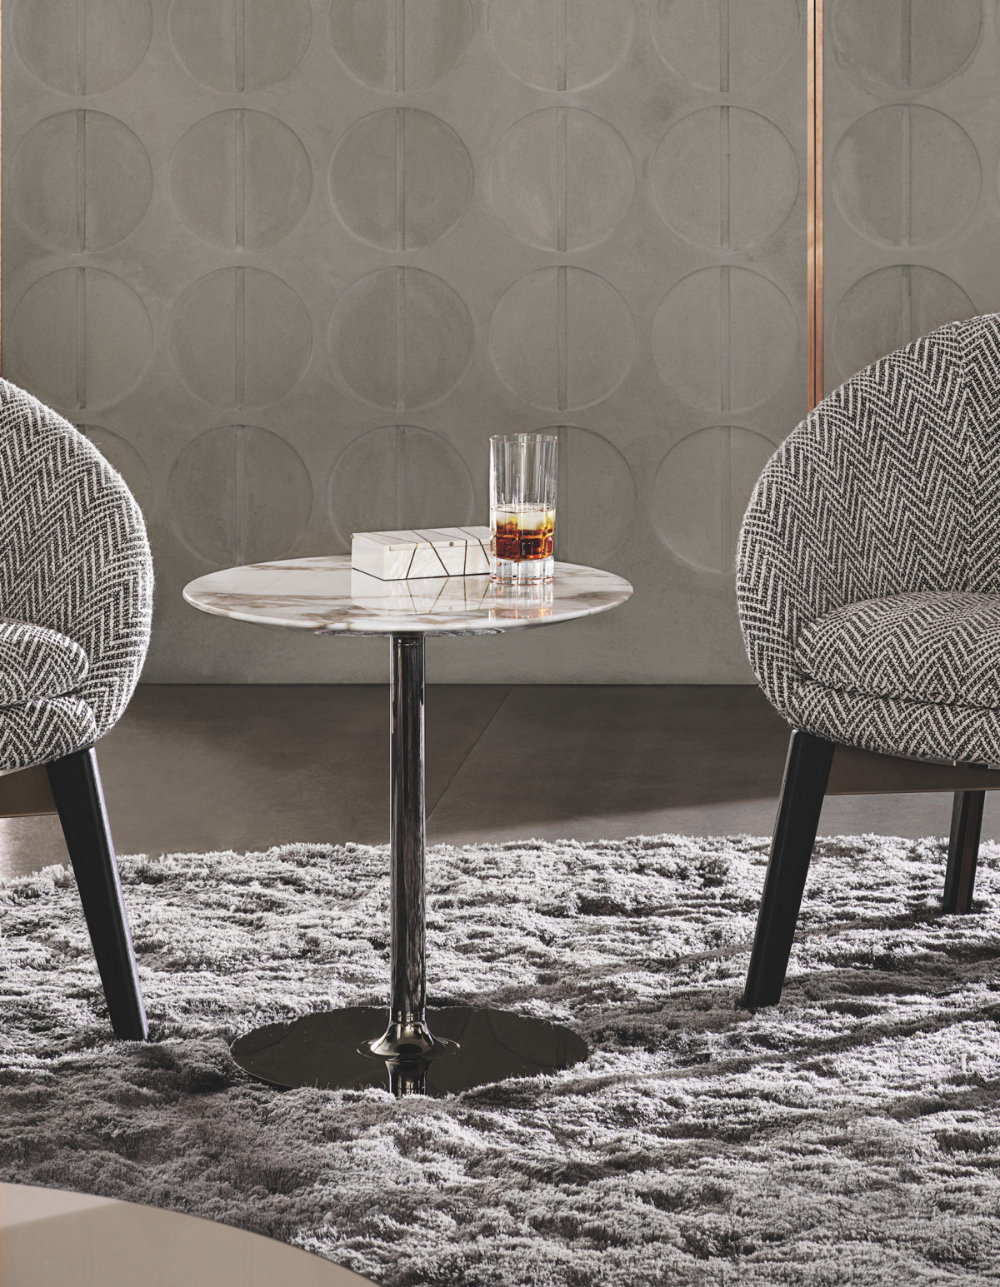 Unique Coffee Table With Ottomans Meja Kopi Modern Desain Meja [ 800 x 1176 Pixel ]